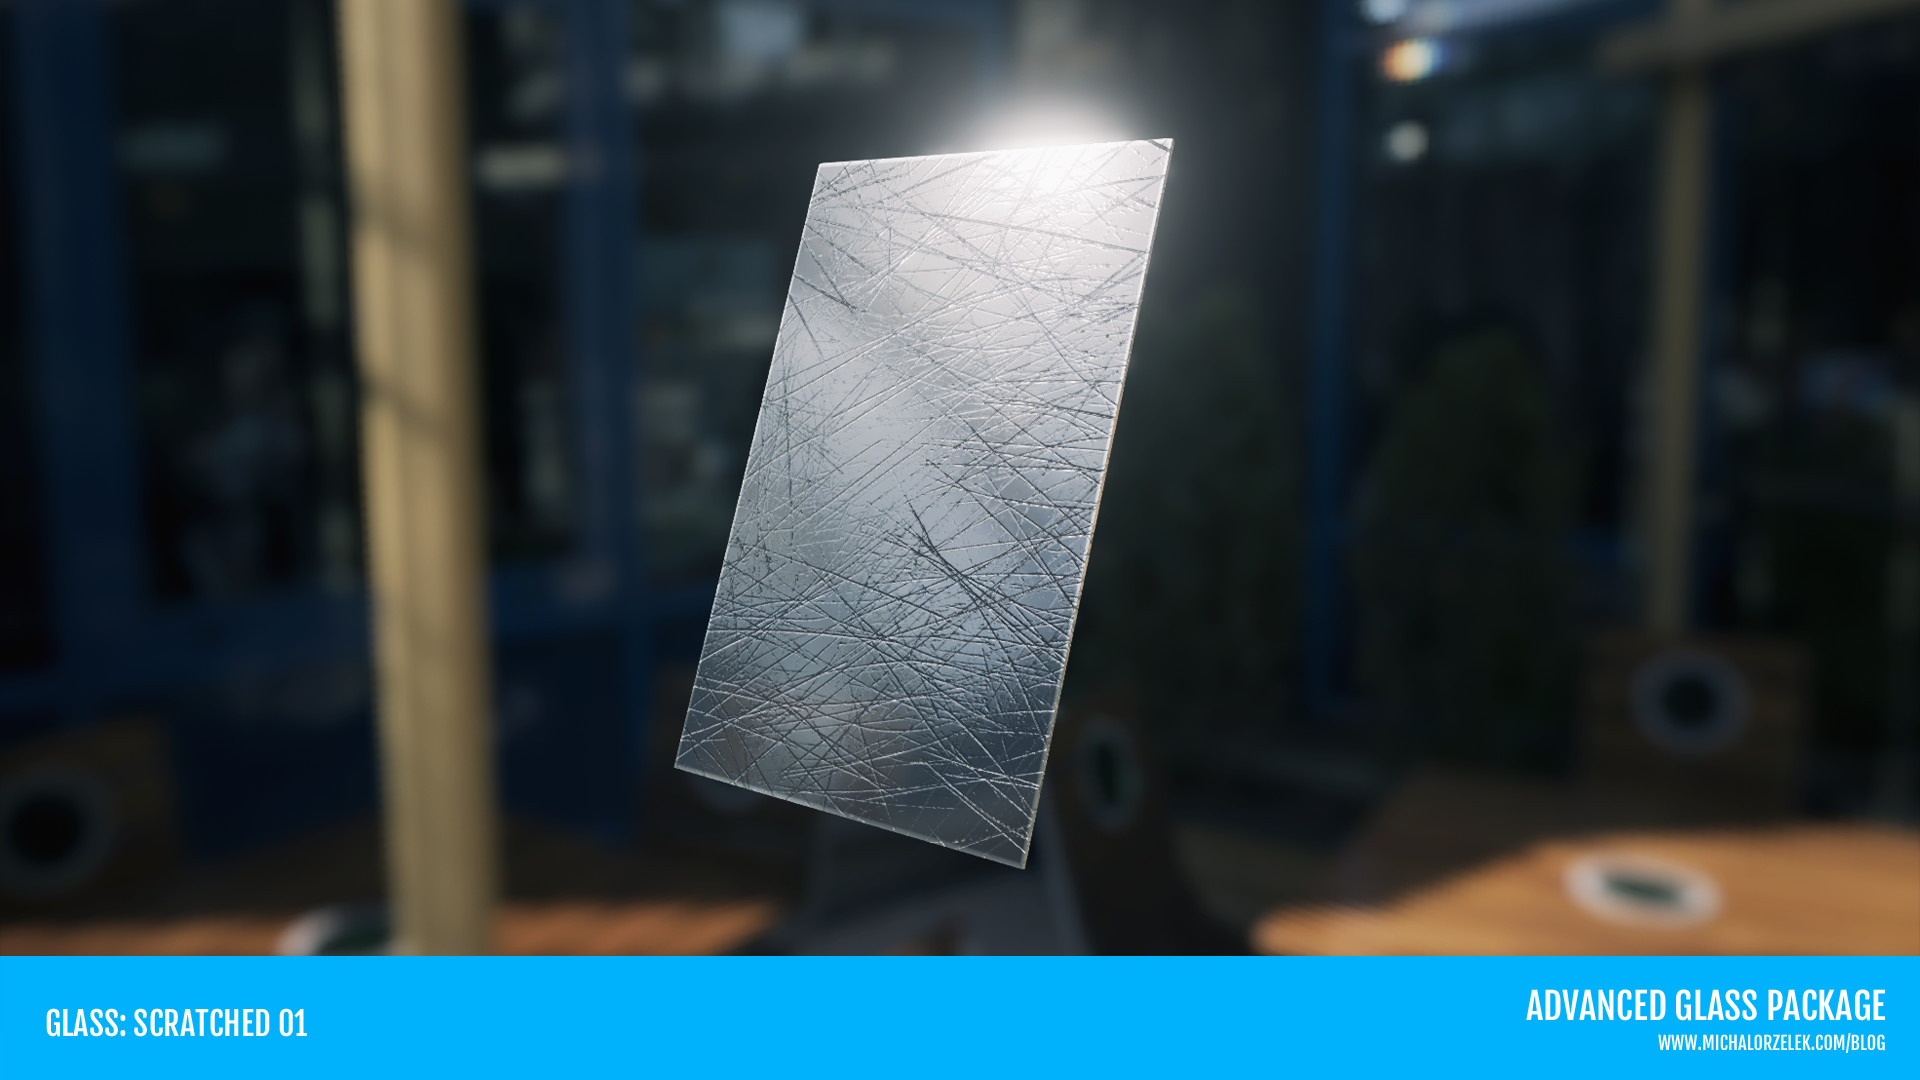 ArtStation - Advanced Glass Material Pack || UE4, Michal Orzelek